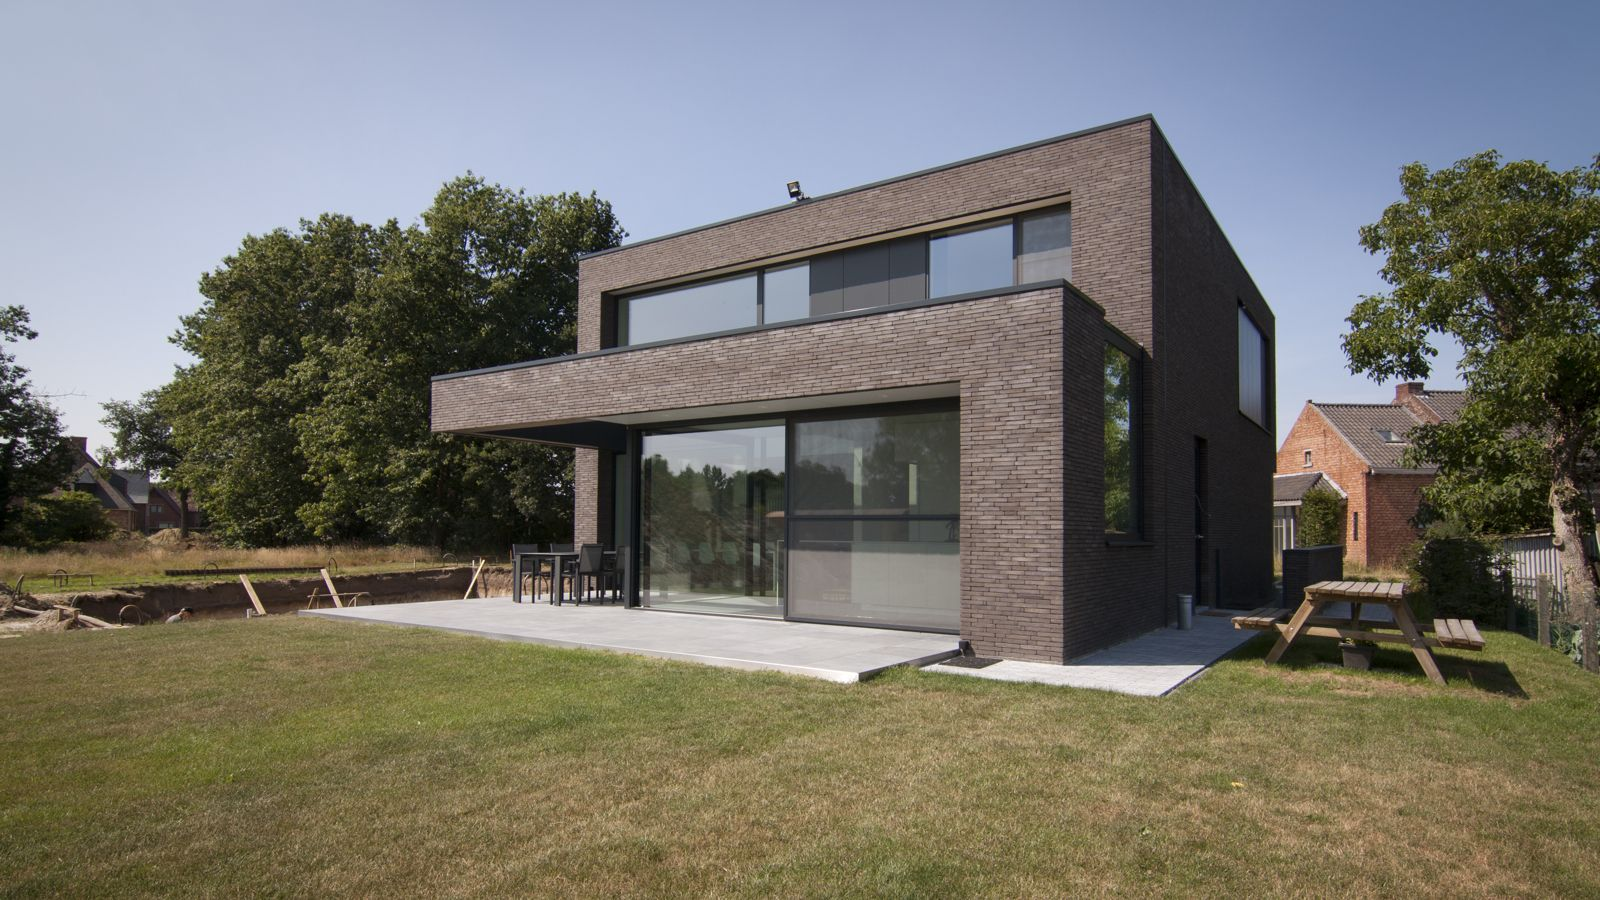 Block office architecten hedendaagse woning te linkhout strakke